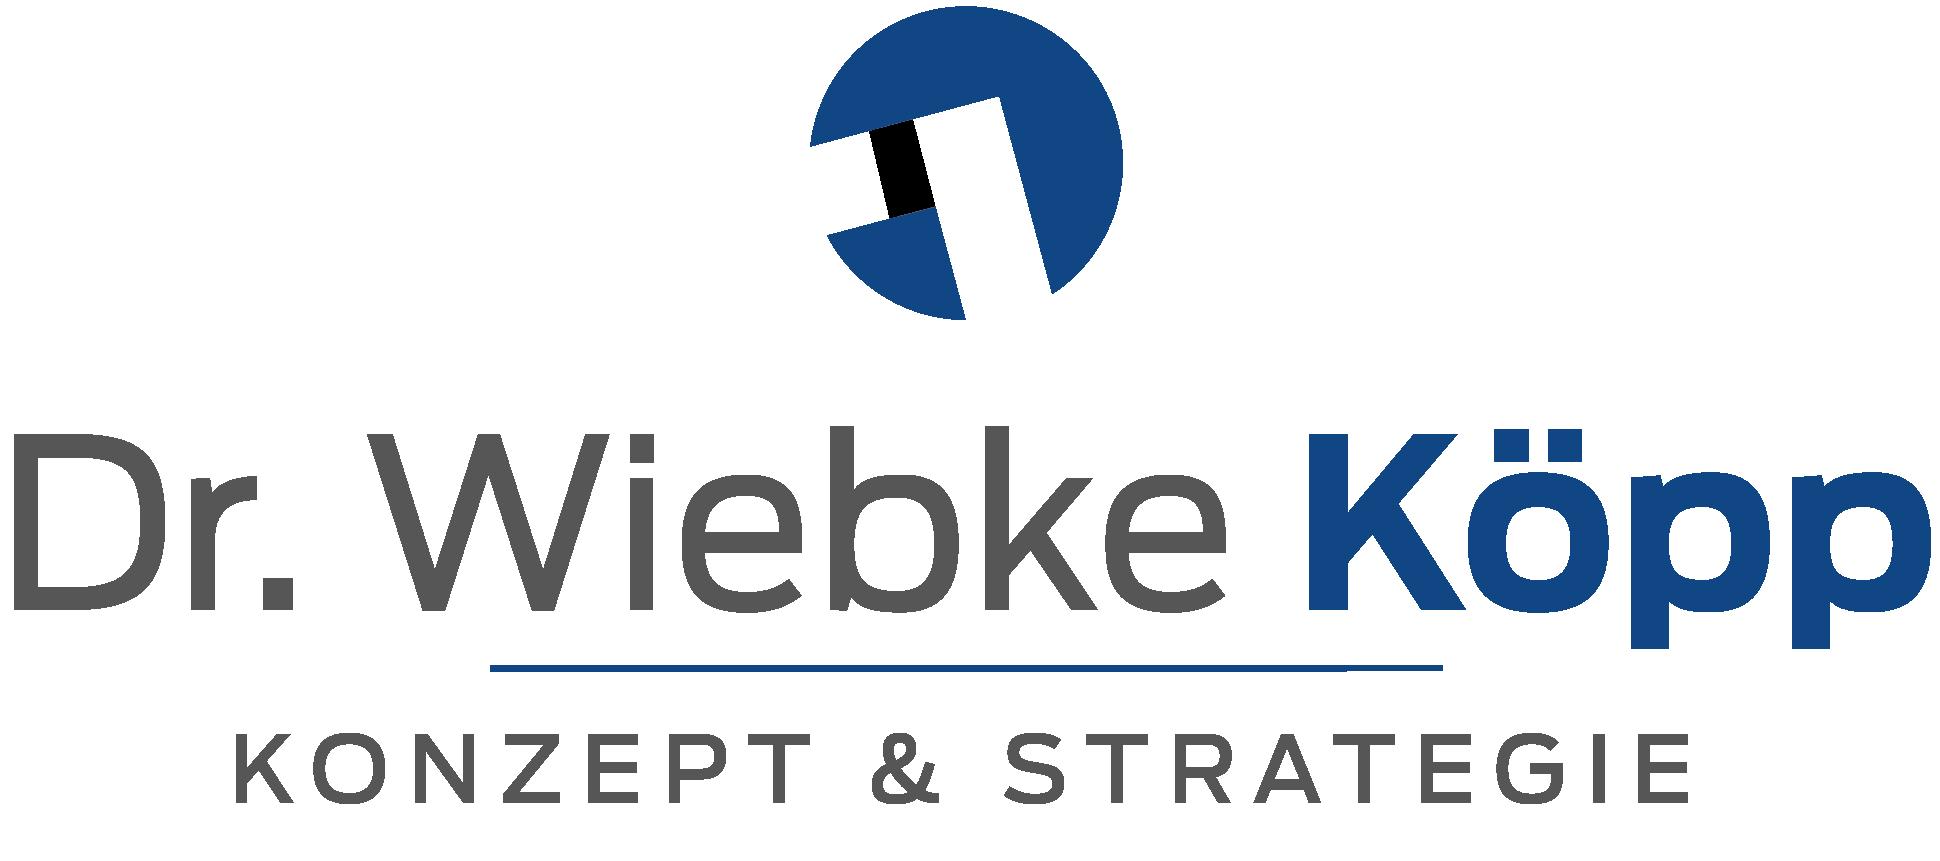 Wiebke Köpp - Konzept & Strategie